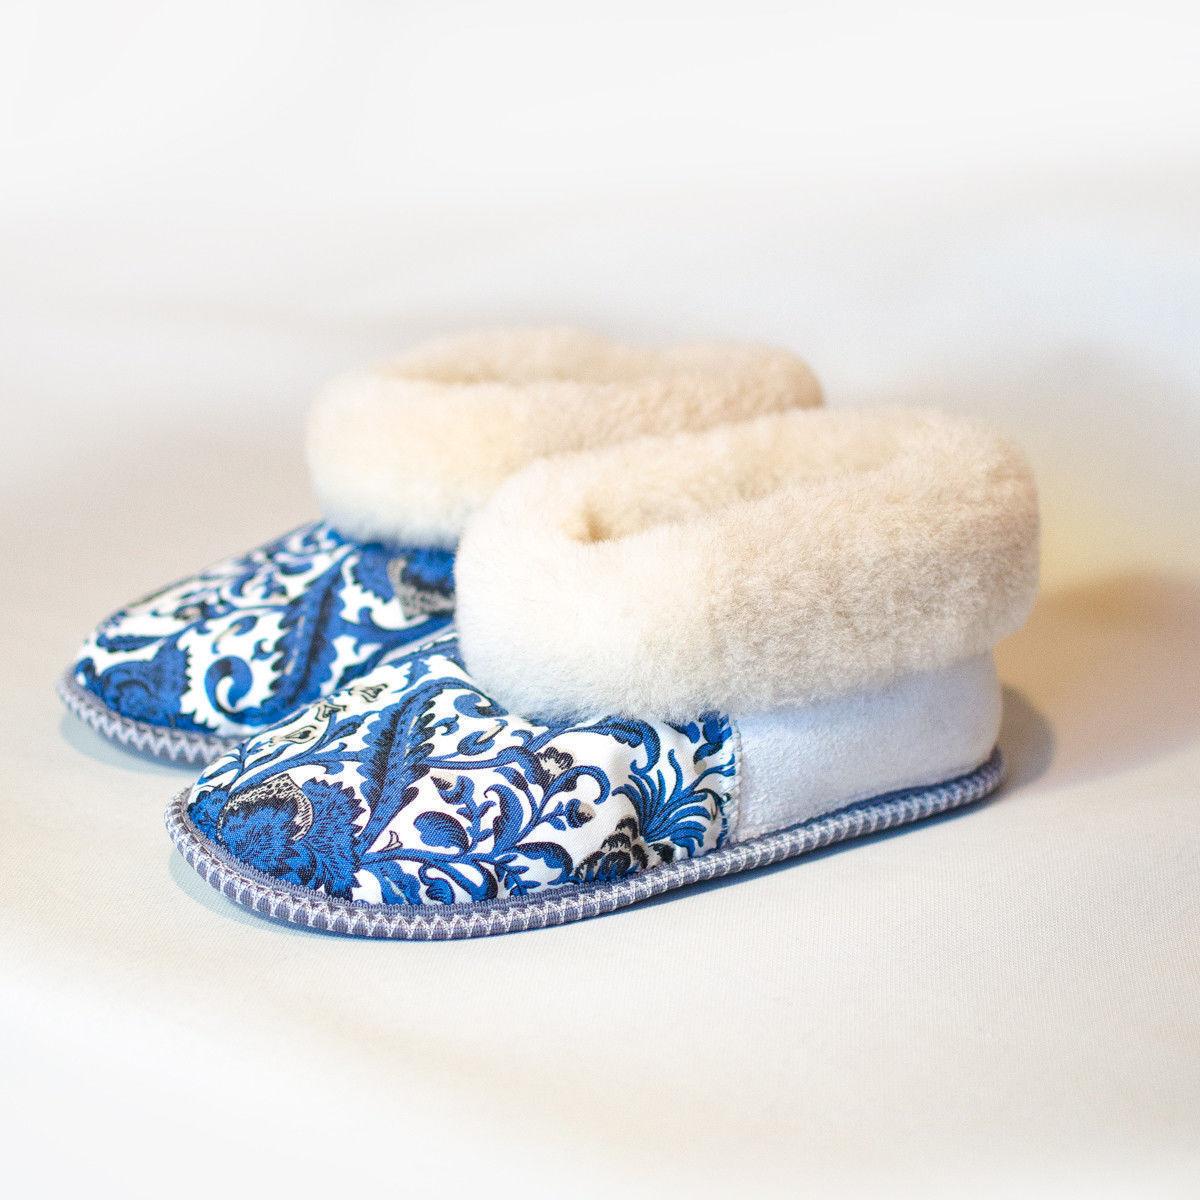 Russian Fur Slippers   100% Natural Sheepskin   Winter   Socks   Wool   Gzhel